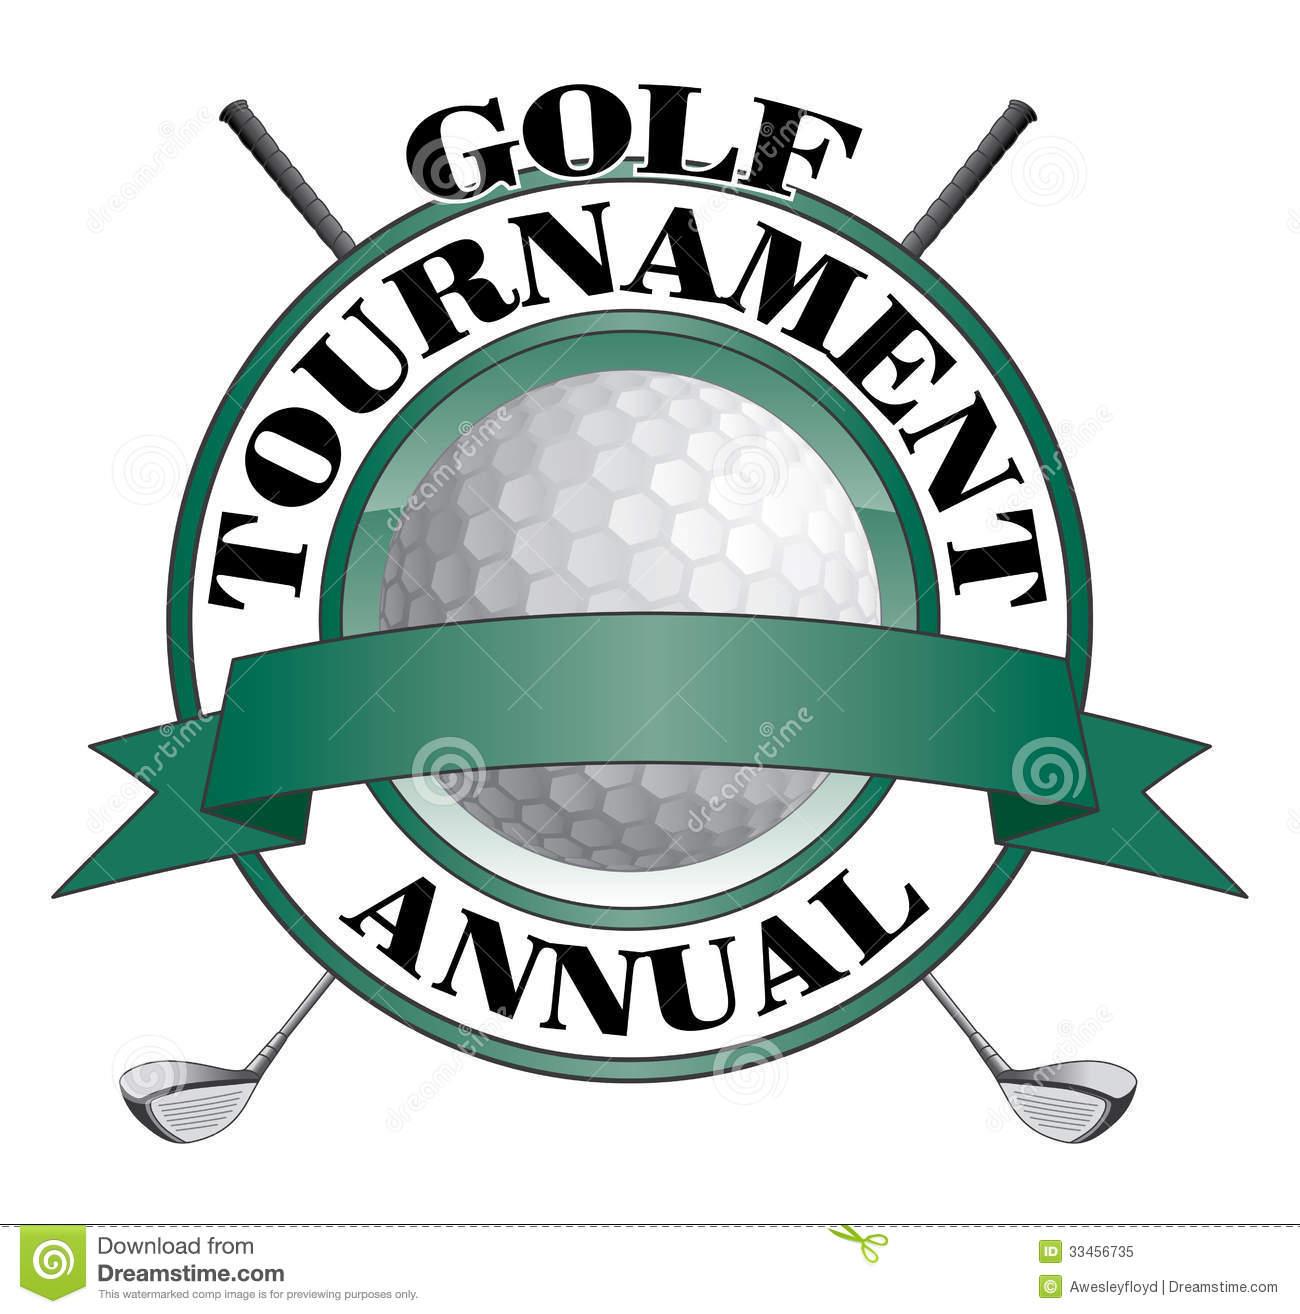 Golf clipart golf tournament. Graphics free download best